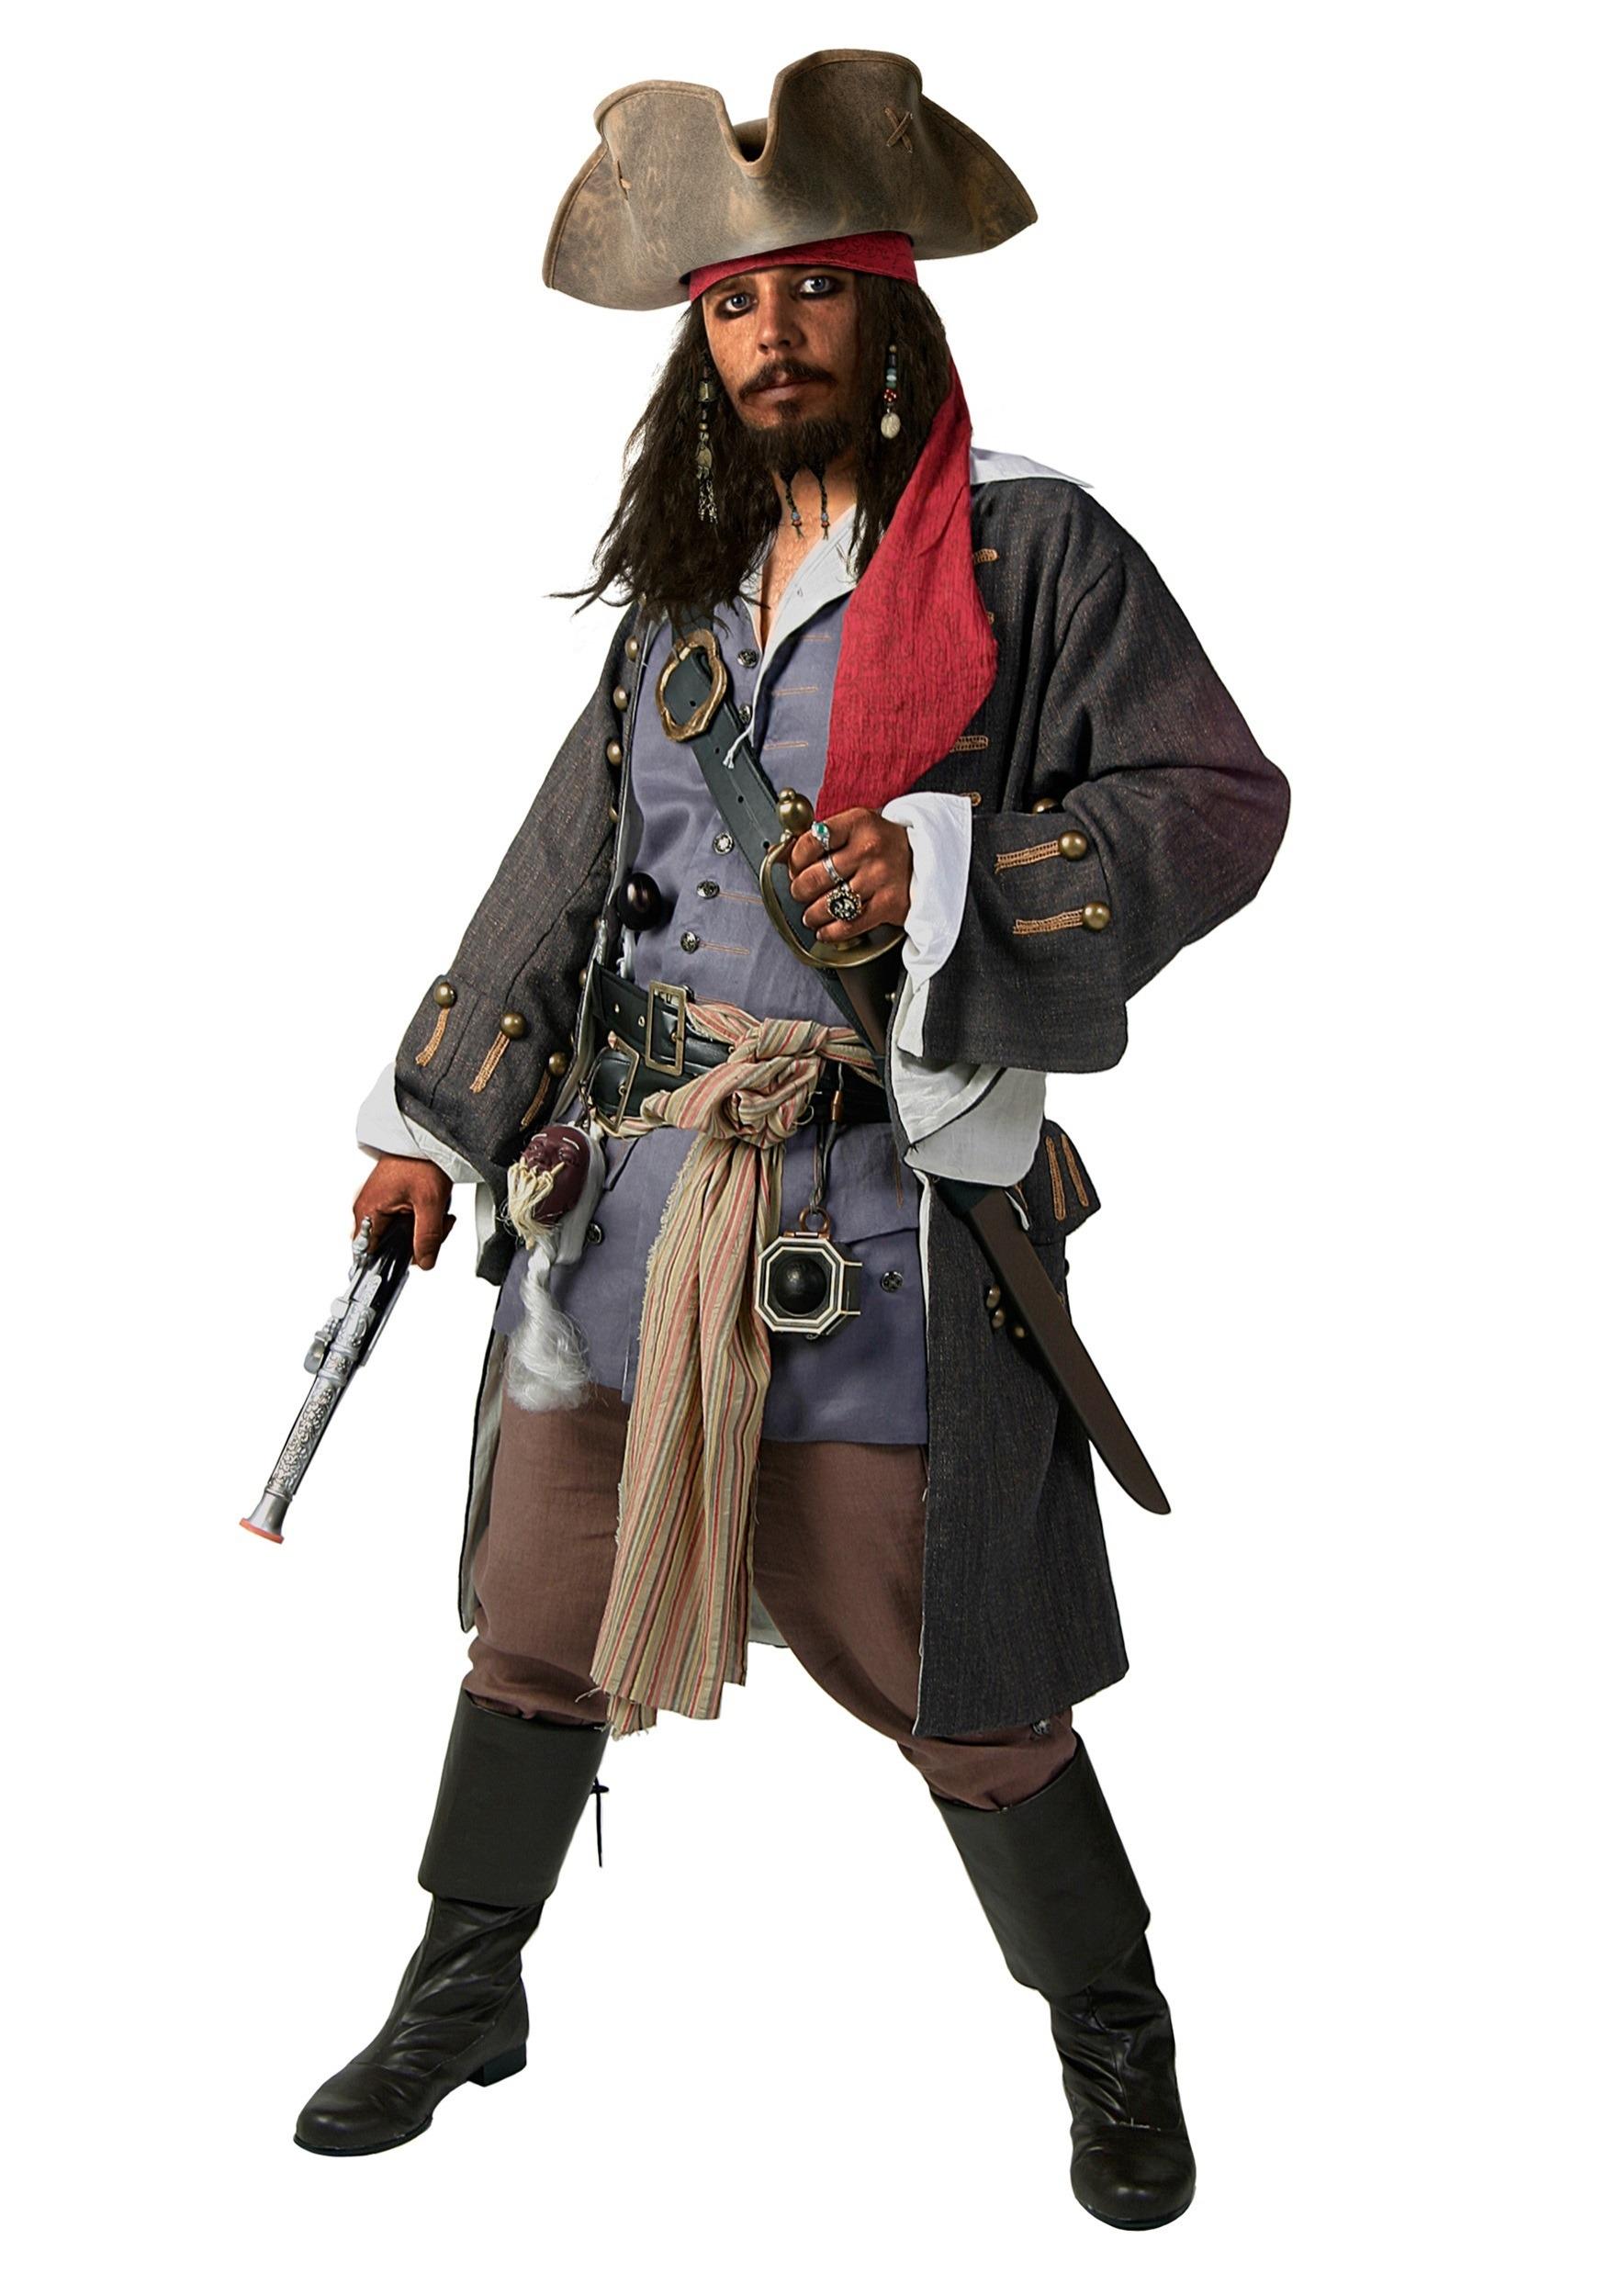 Pirate costume photo